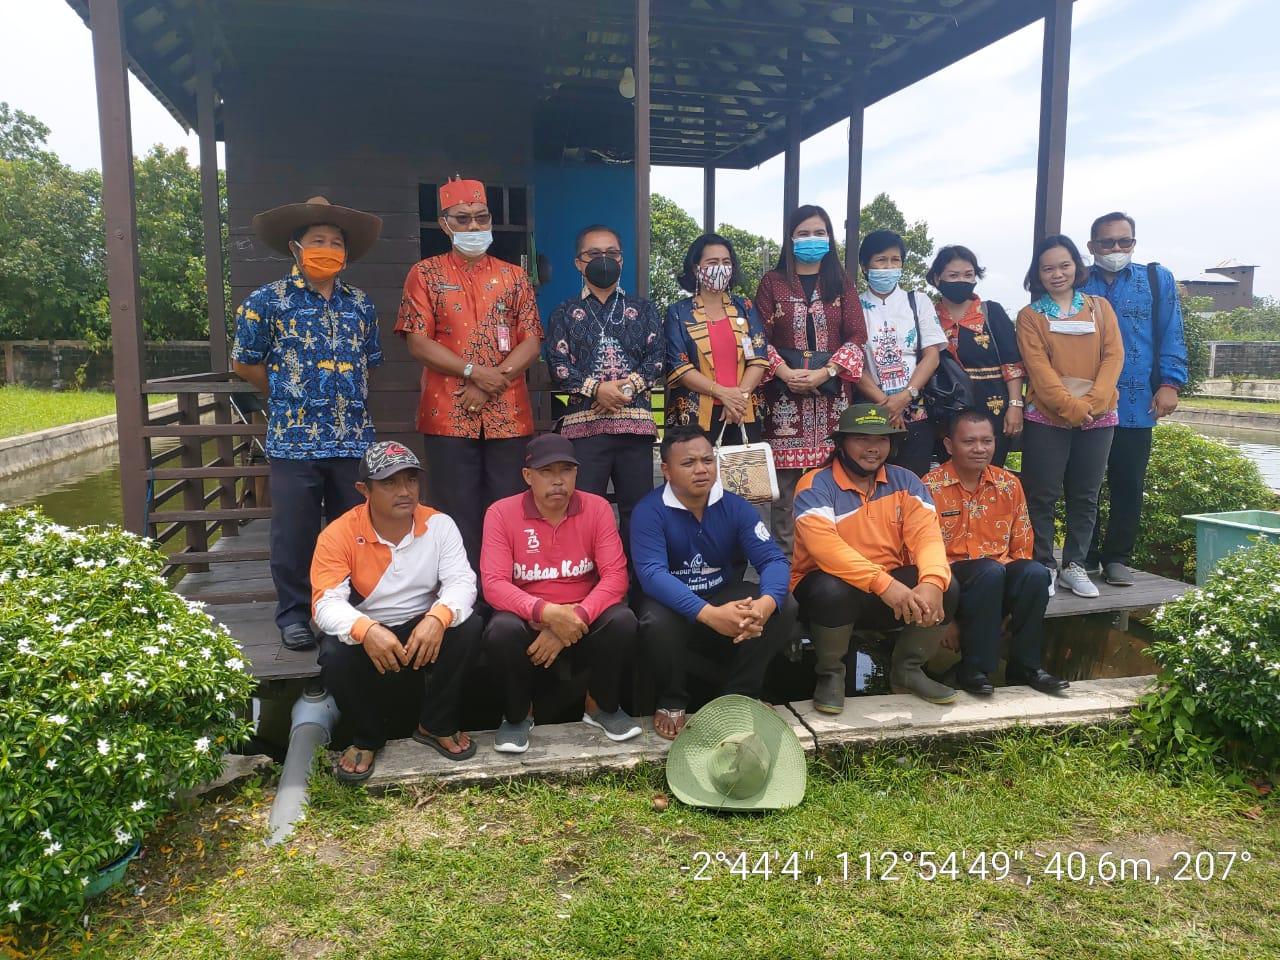 KUNJUNGAN : Anggota DPRD Gunung Mas, Rayaniatie Djangkan (memegang tas) berkunjung ke Dinas Perikanan dan Kelautan Kotim, belum lama ini./